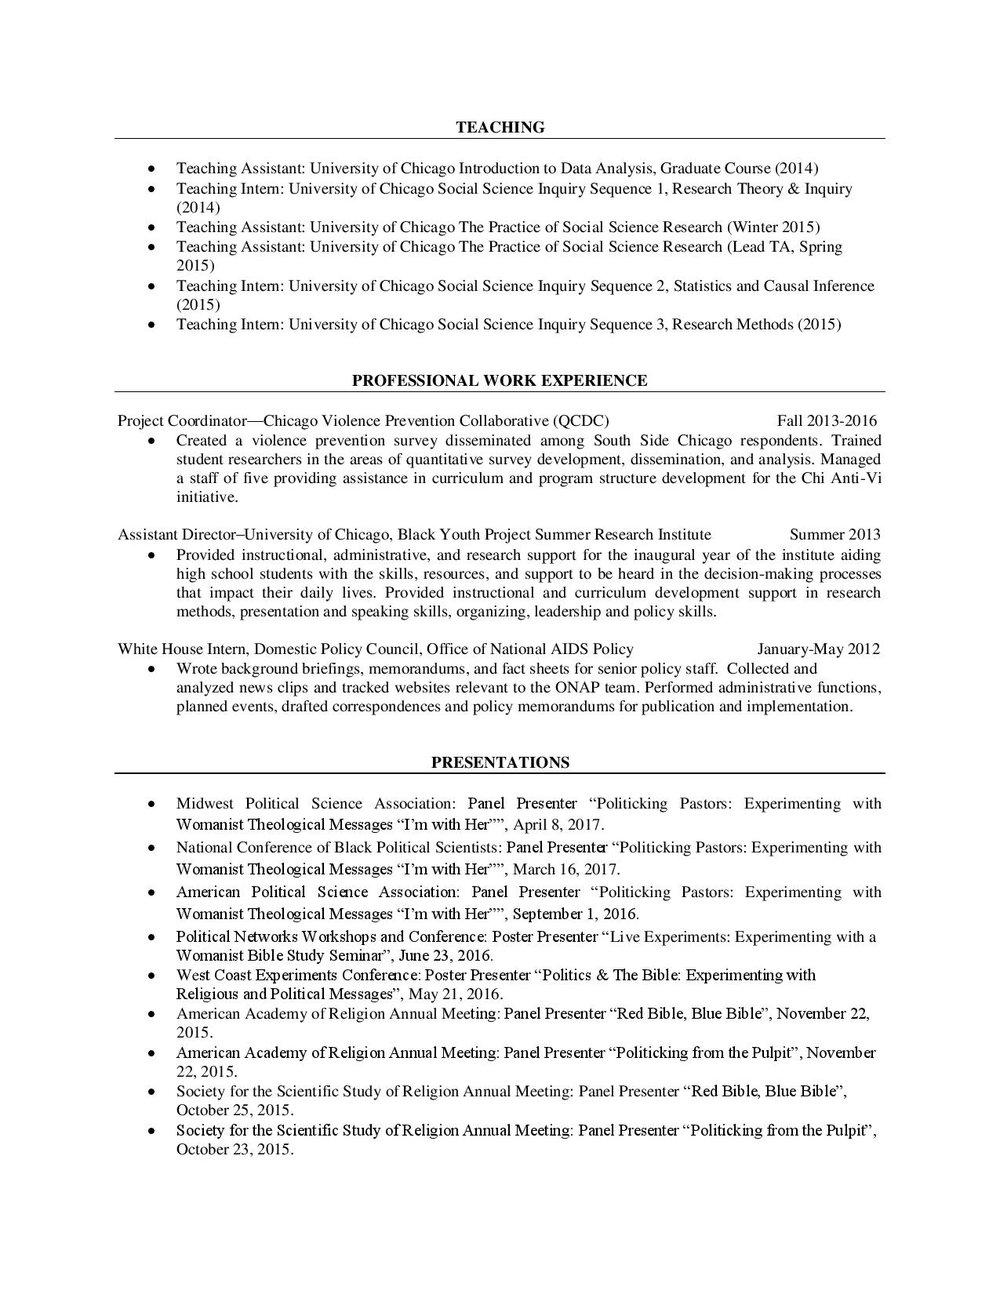 DKU CV public-page-003 (1).jpg